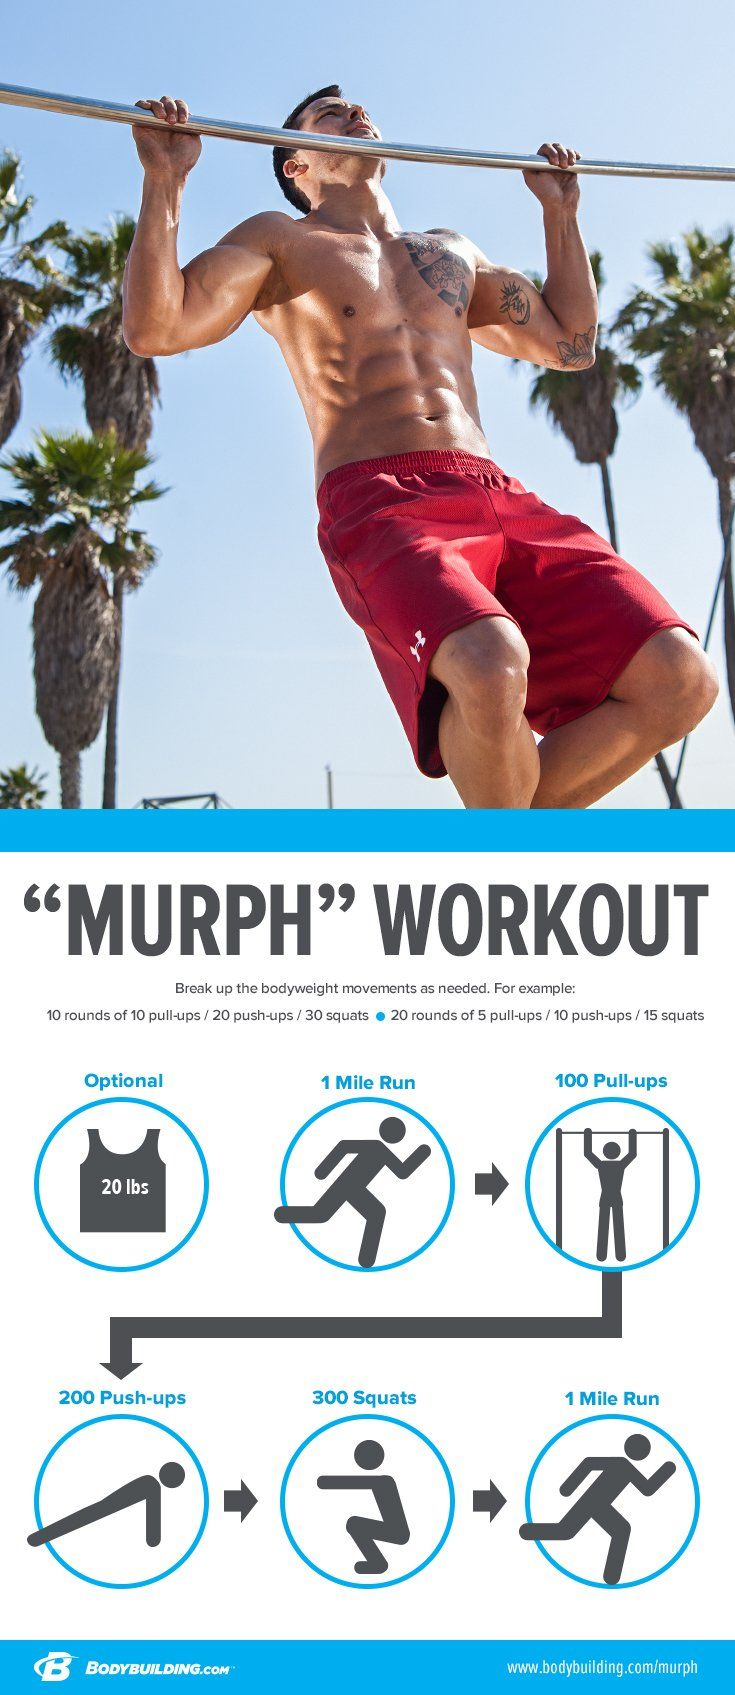 The Real Reason We Do Murph On Memorial Day Murph Workout Workout Body Type Workout